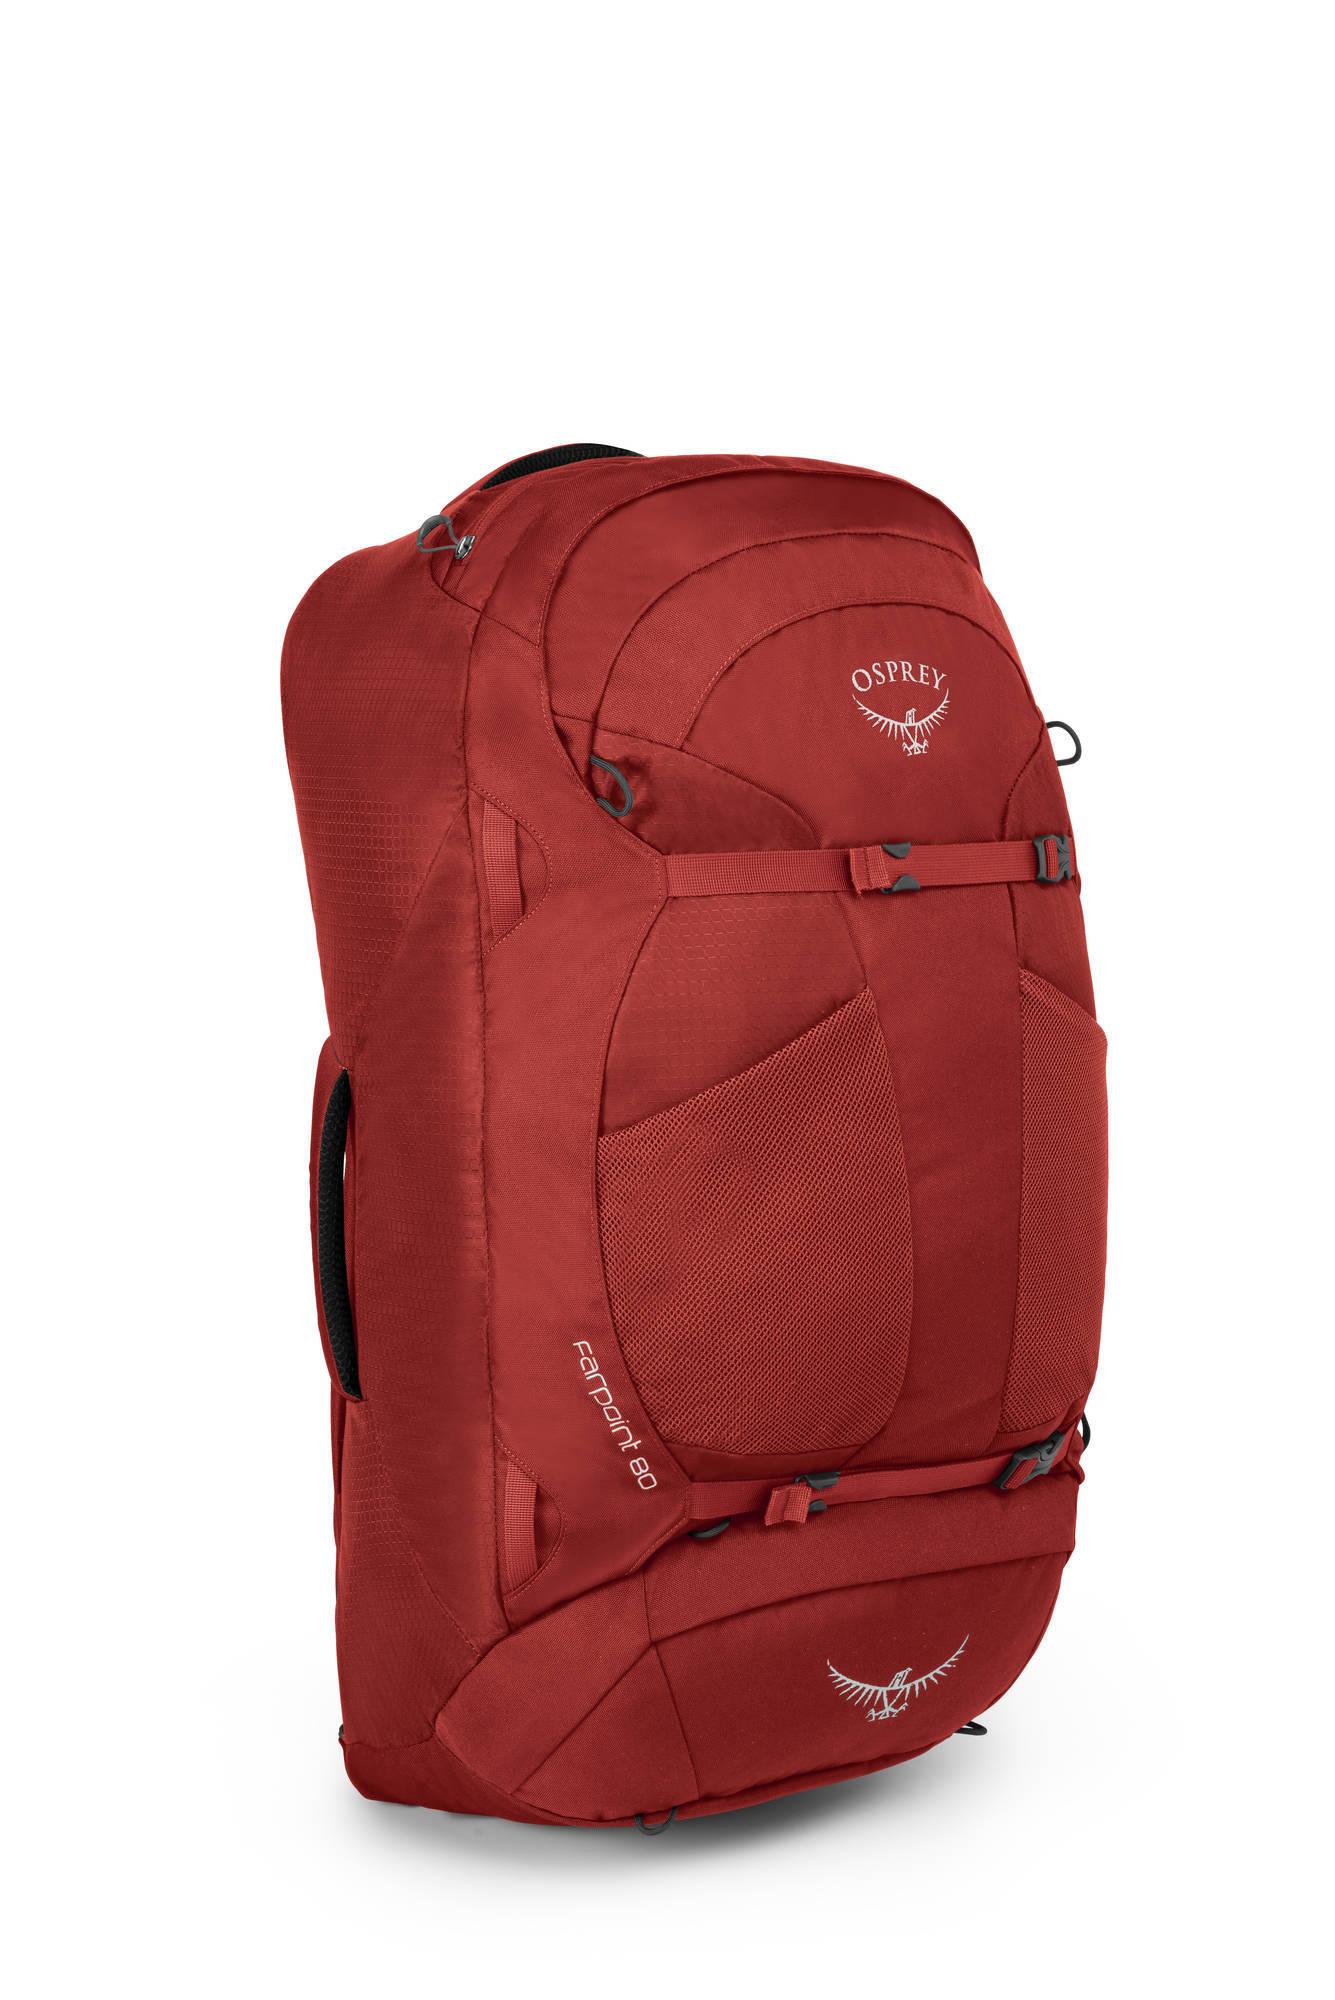 Сумки-рюкзаки Сумка рюкзак Osprey Farpoint 80 Farpoint_80_Side_Jasper_Red_web.jpg